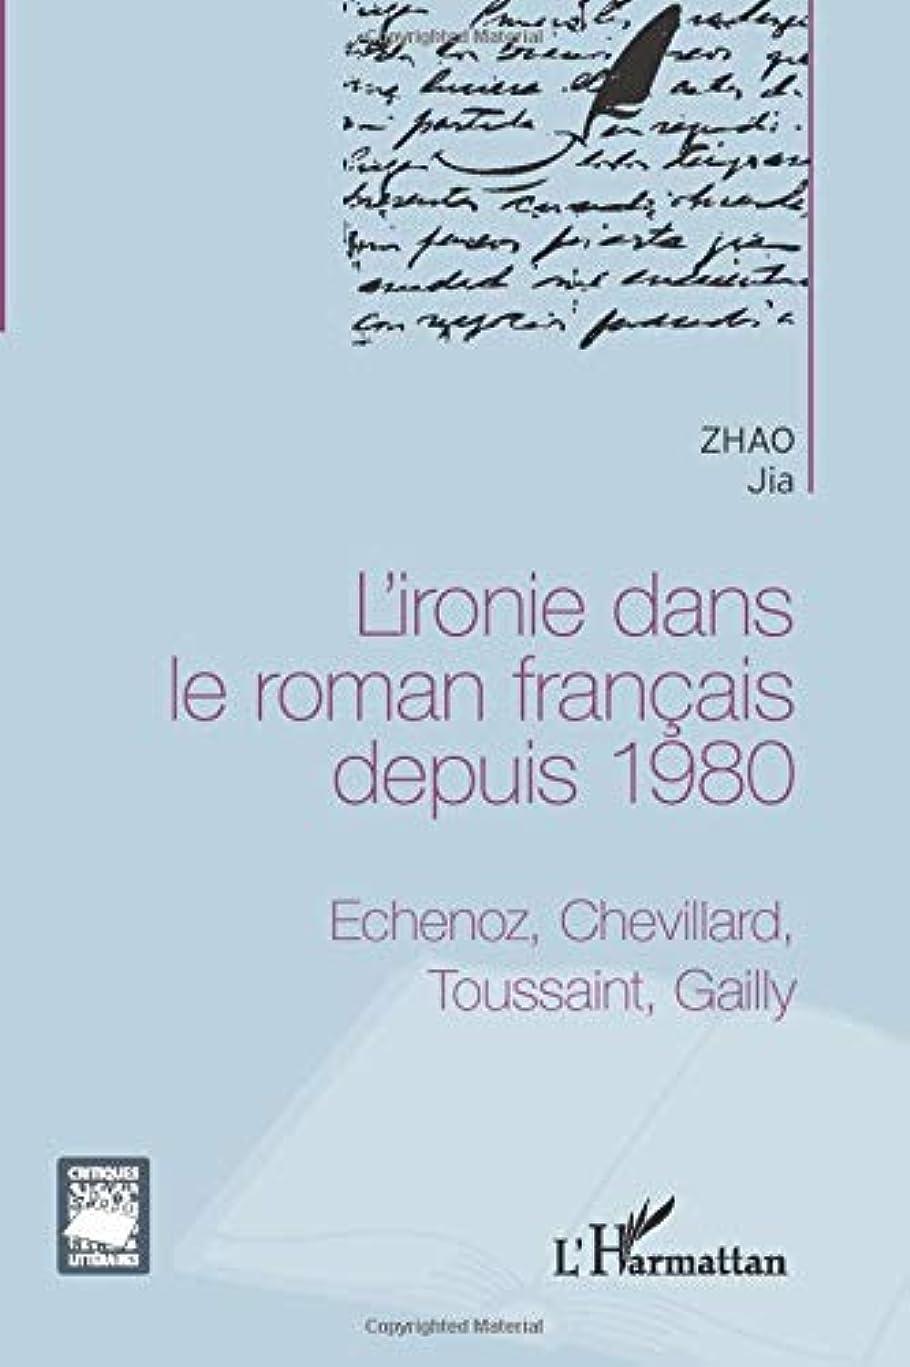 死の顎実際遷移L'ironie dans le roman fran?ais depuis 1980: Echenoz, Chevillard, Toussaint, Gailly